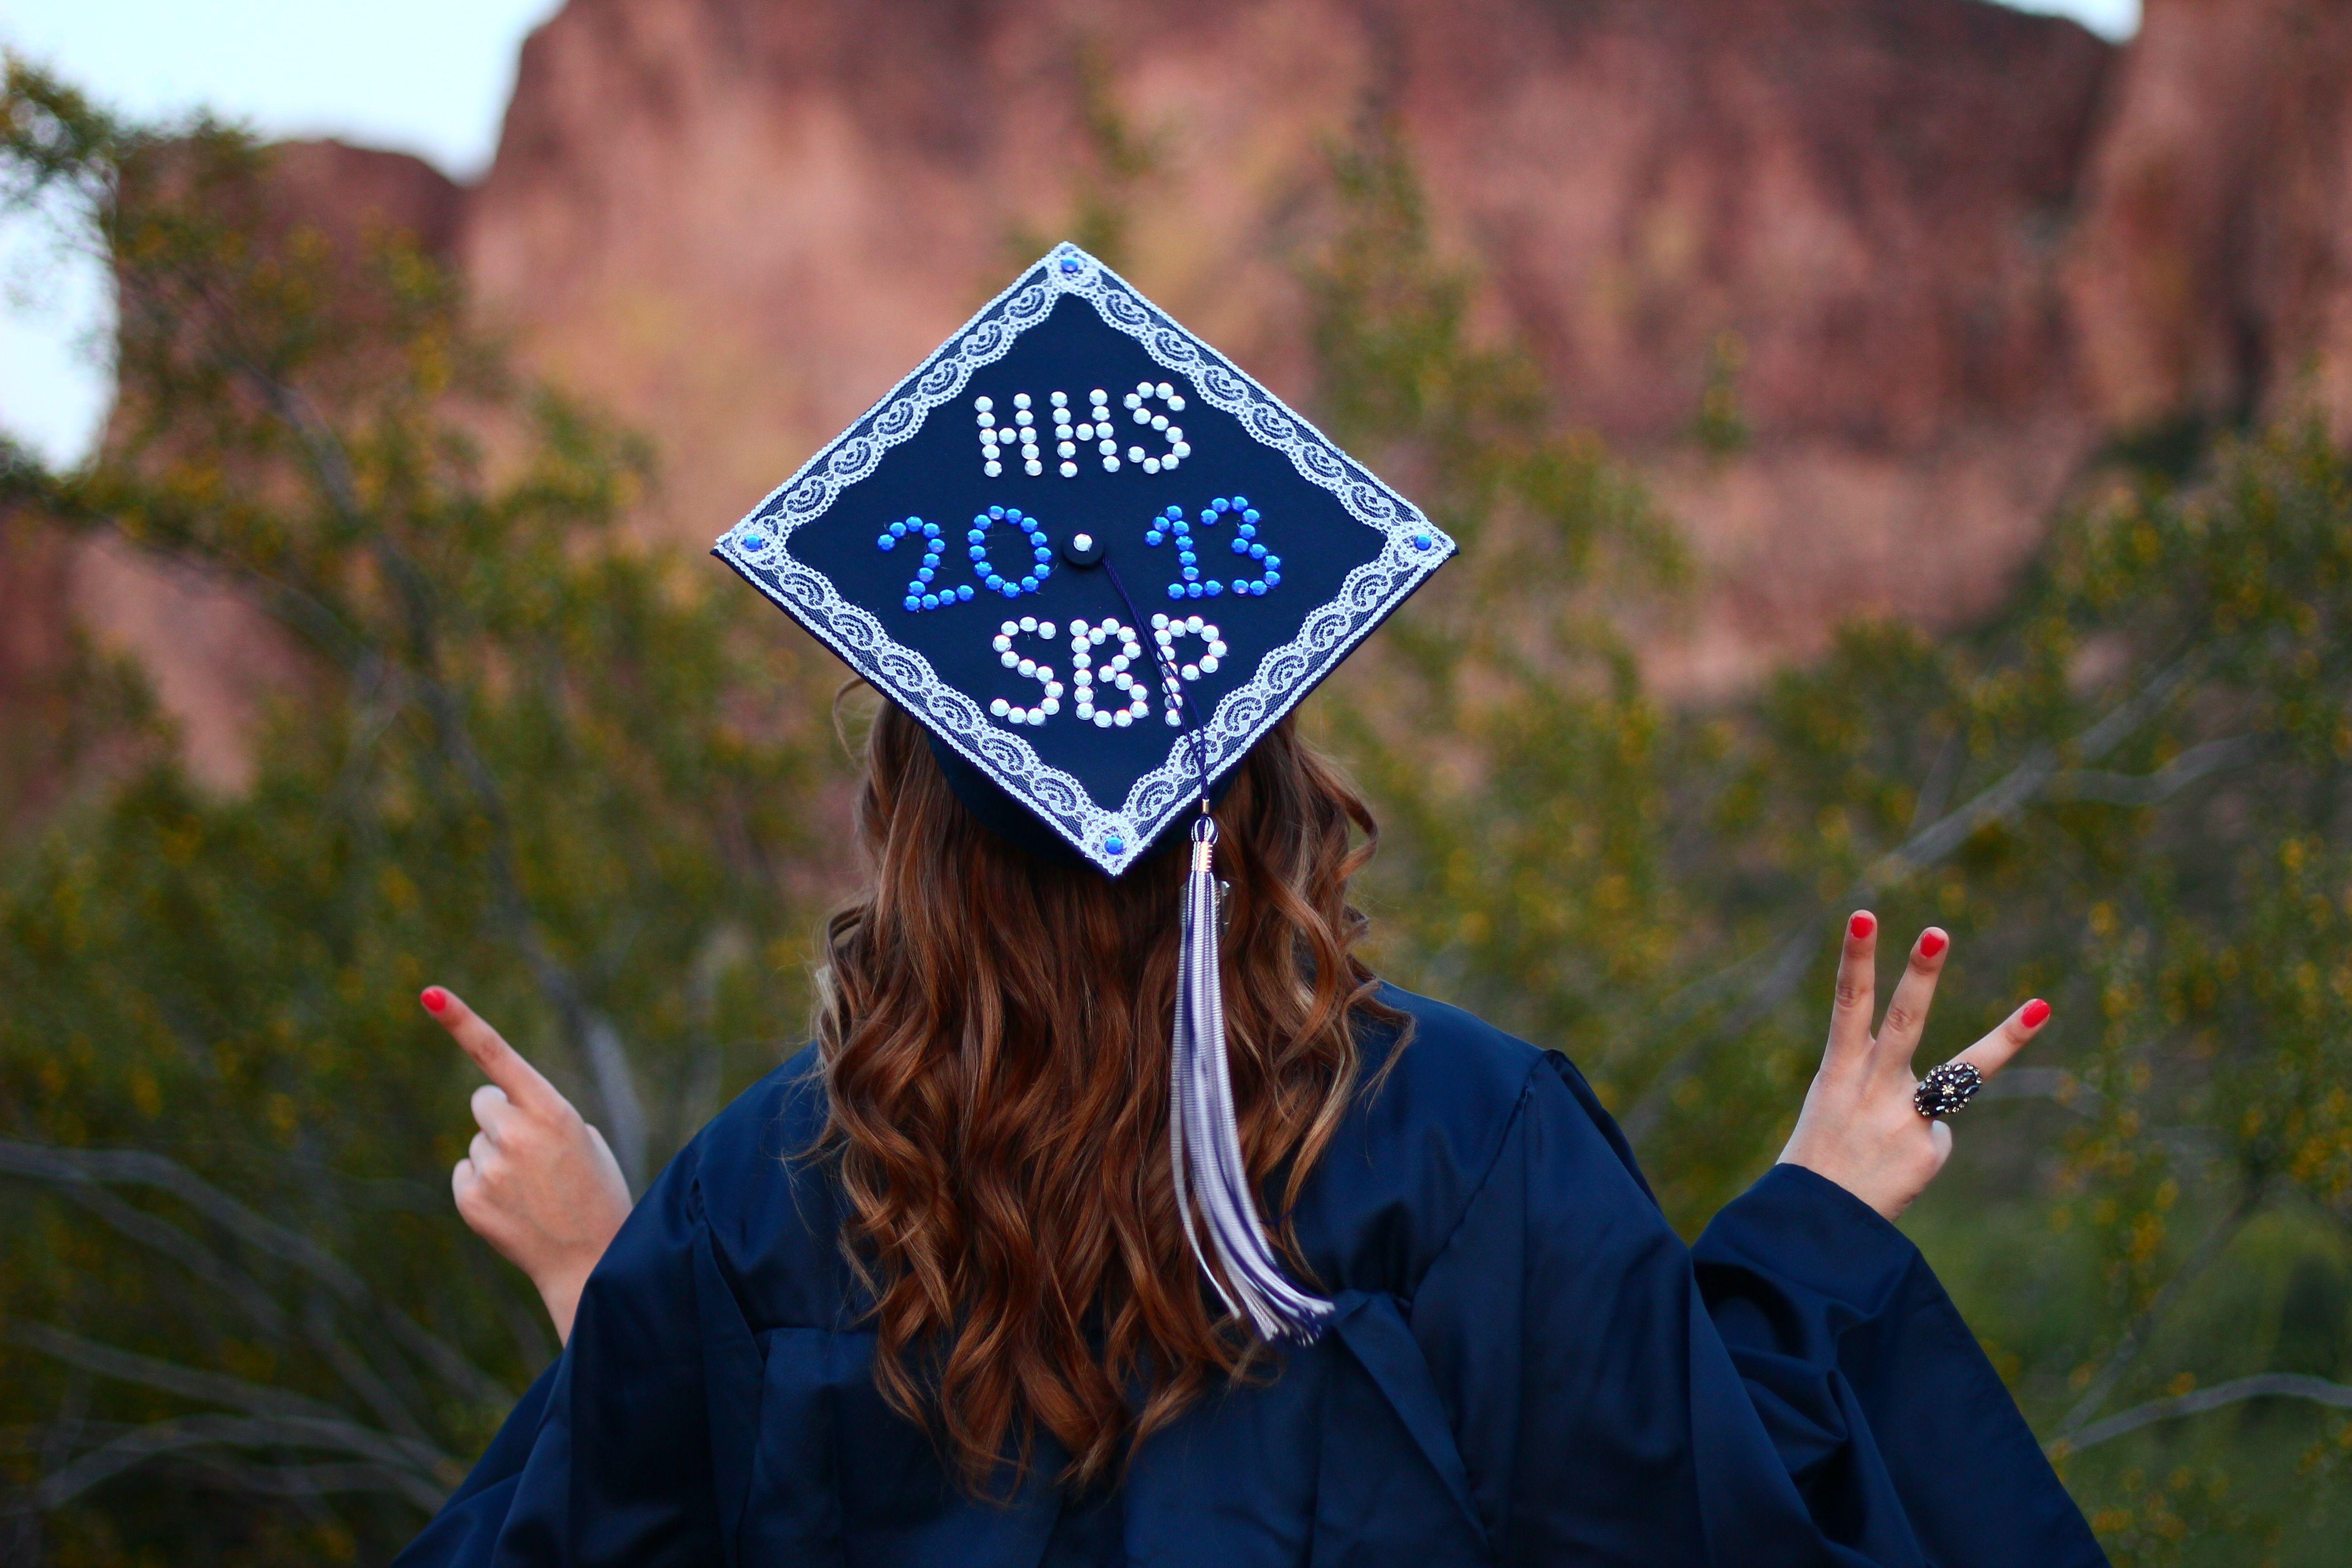 17 Best images about Cap and Gown on Pinterest | Graduation, Cap ...